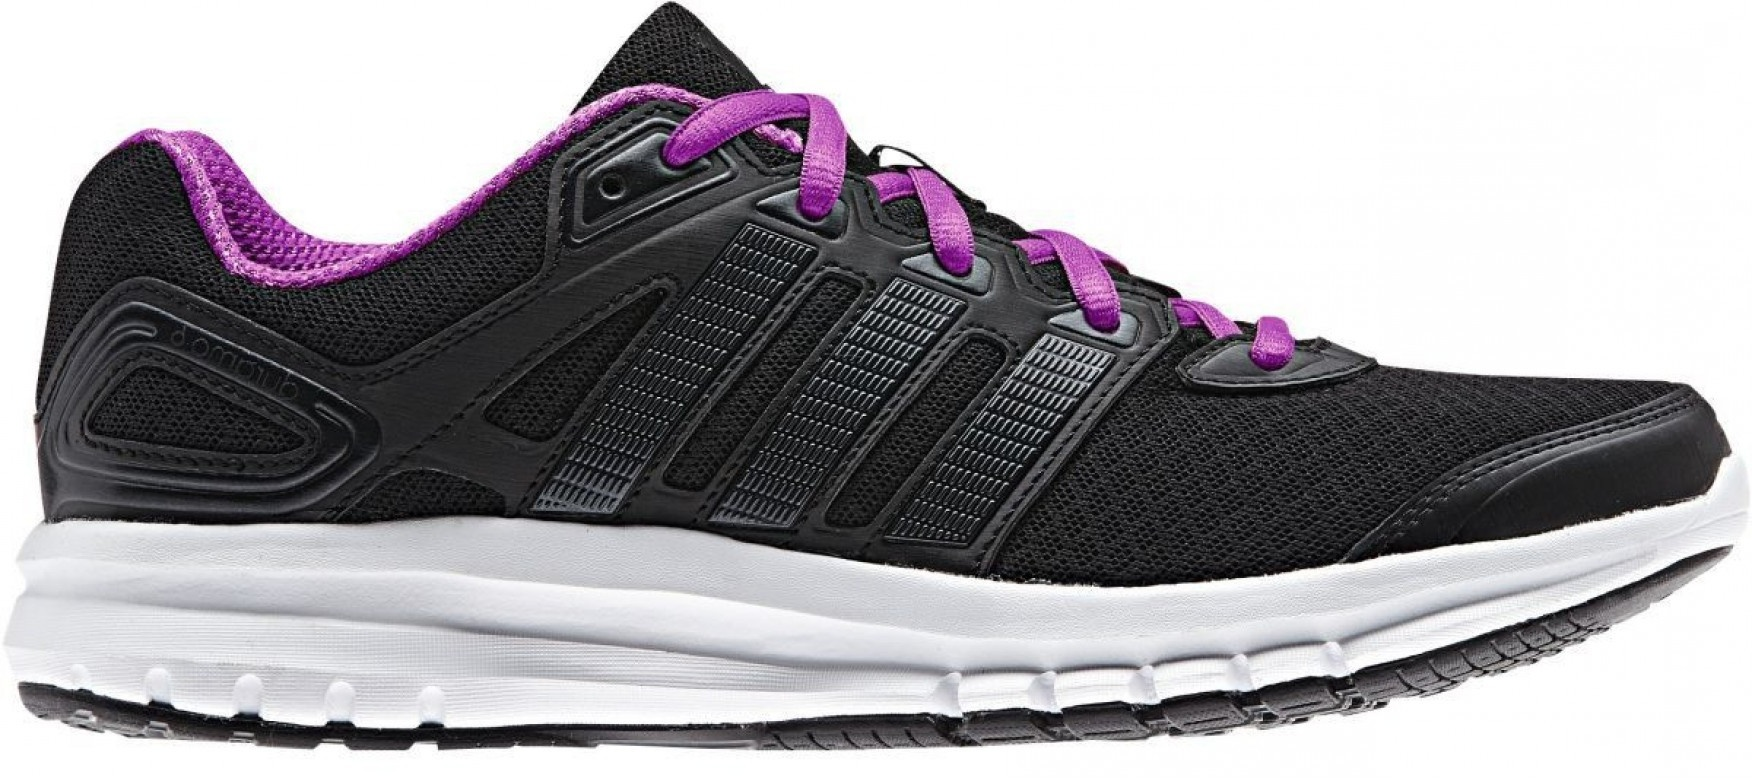 new concept 2de9a ade15 adidas adidas running shoes Duramo 6 womens black